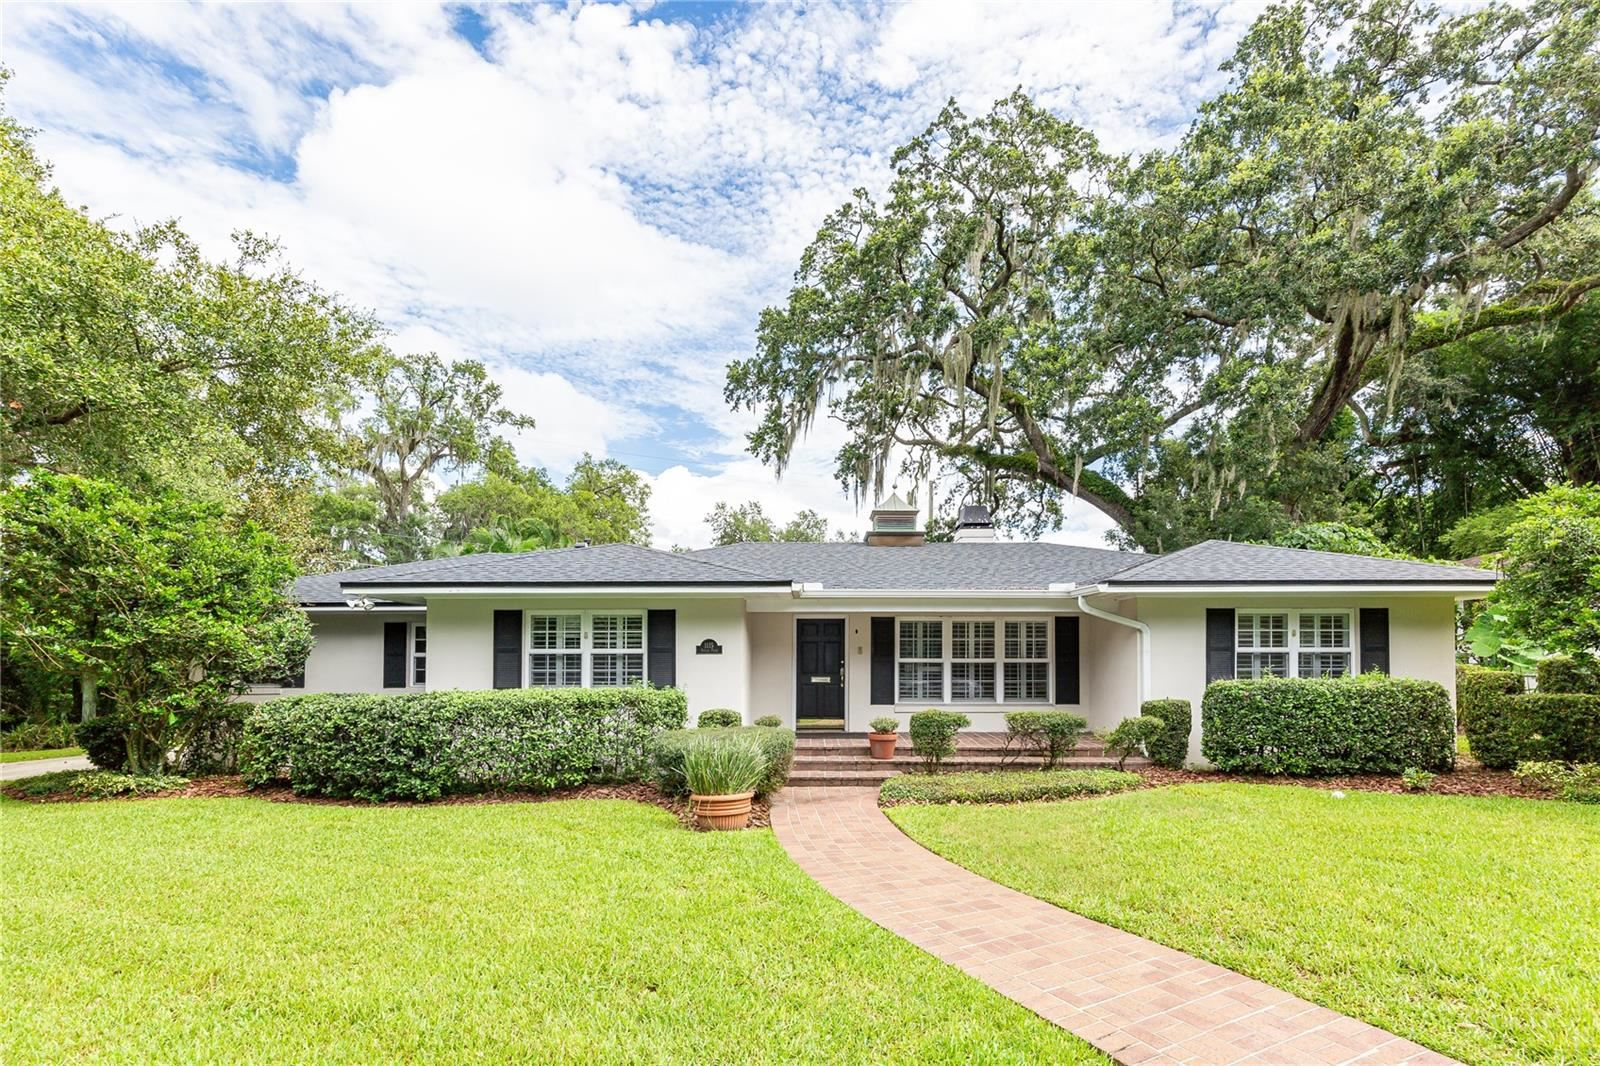 1115 SEVILLE PLACE, Orlando, FL 32804 - #: O5965816